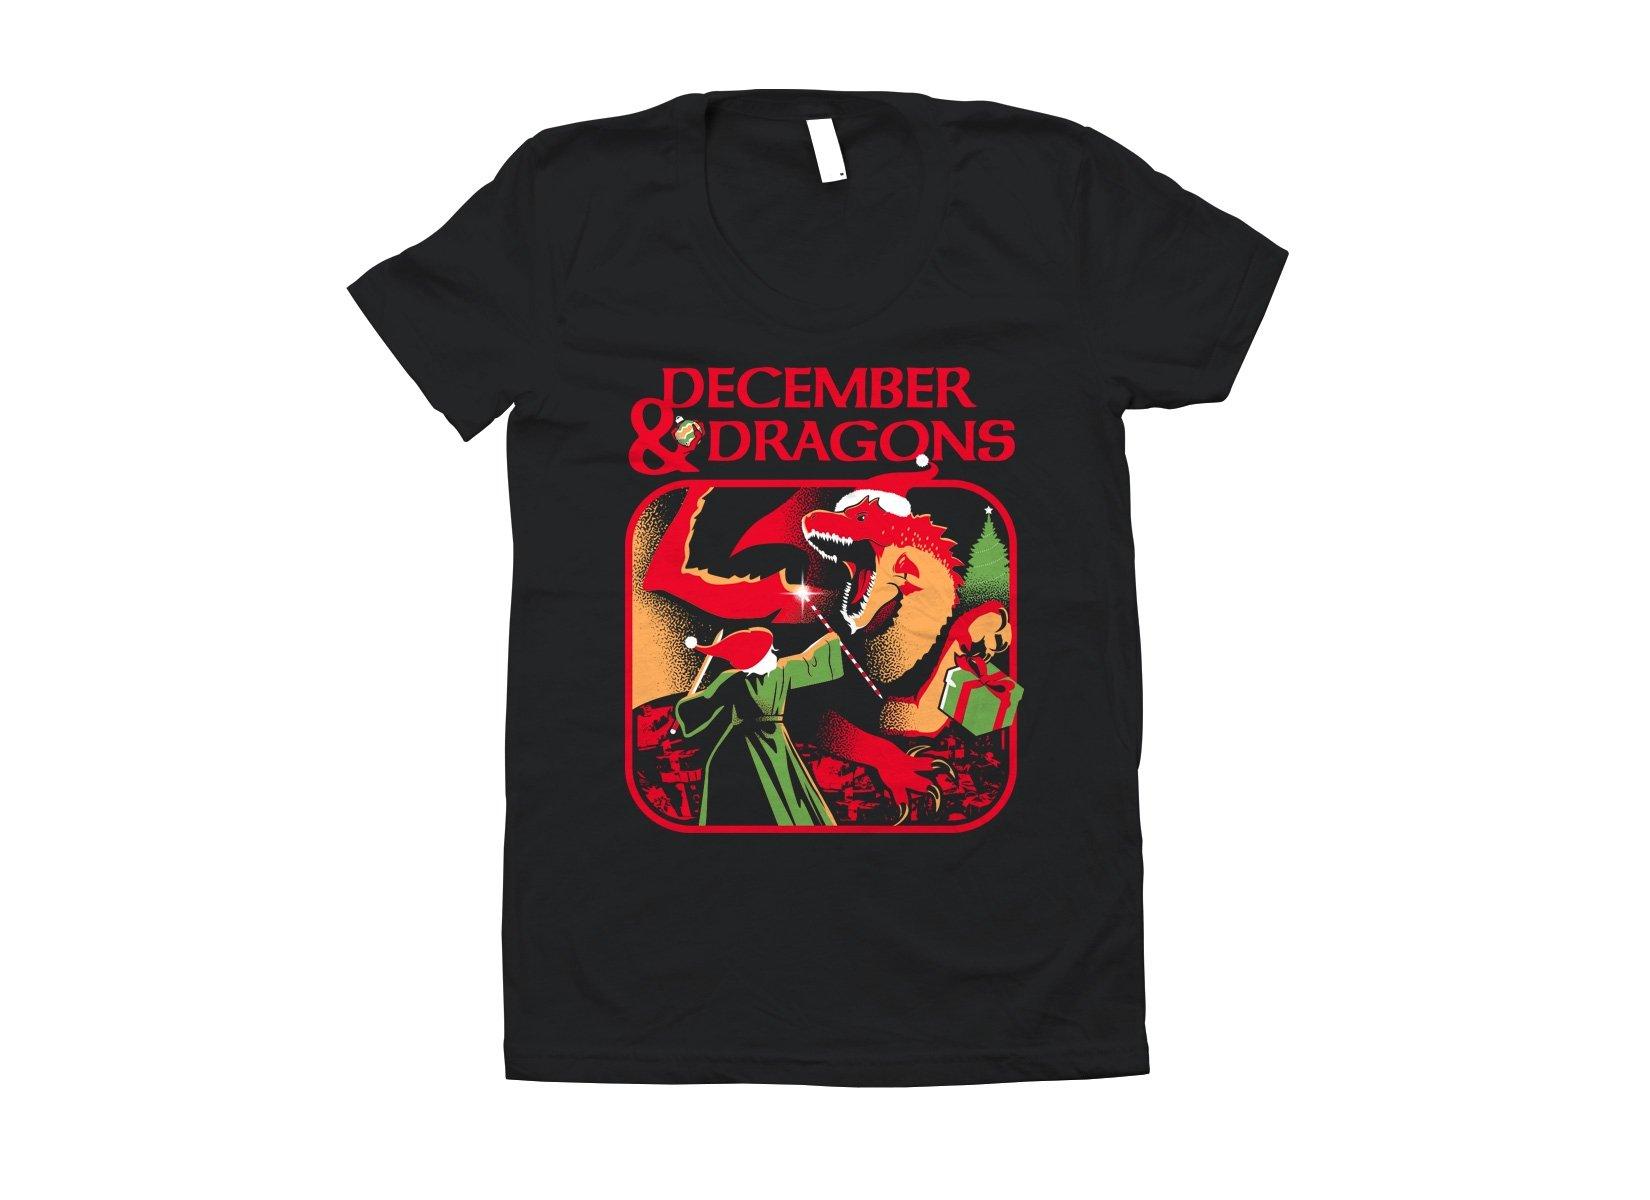 December & Dragons on Juniors T-Shirt